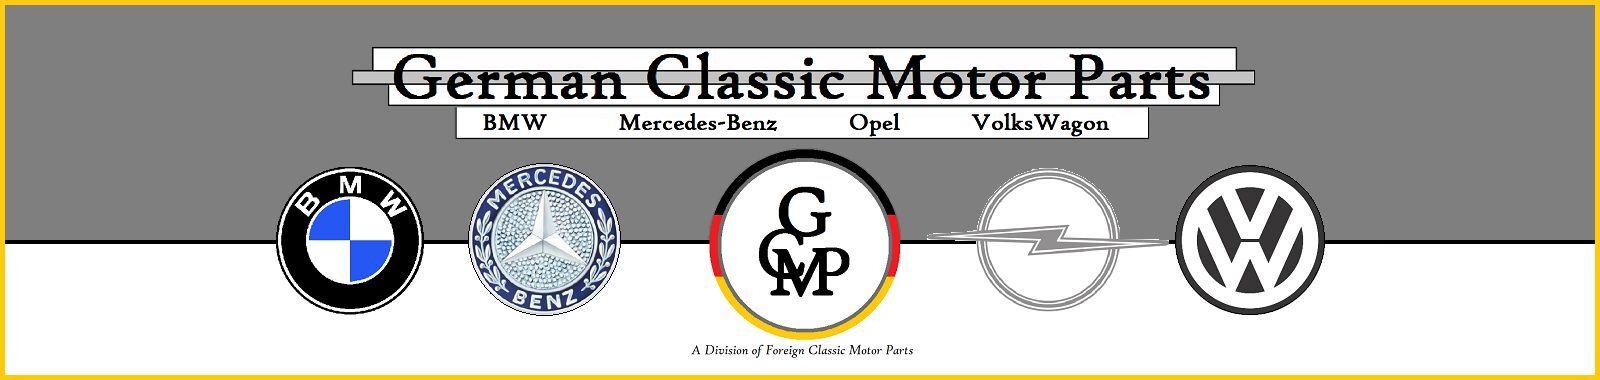 German Classic Motor Parts